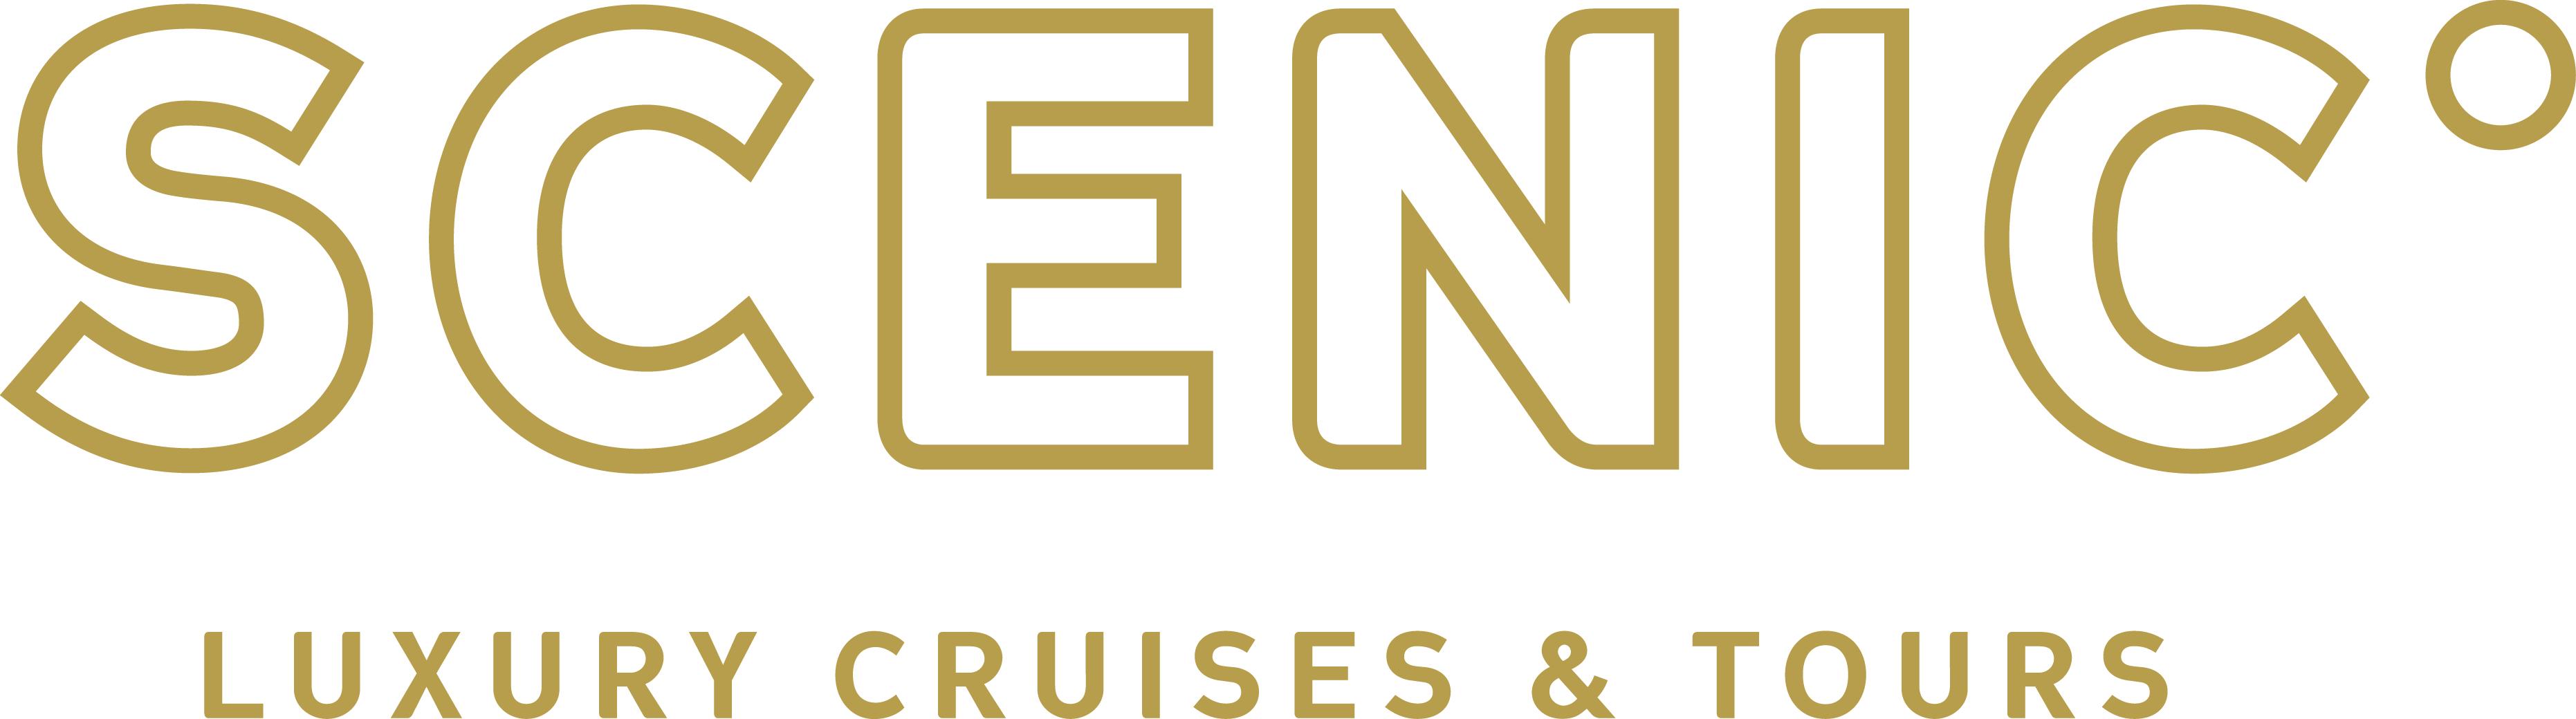 Scenic Logo Gold CMYK Tagline